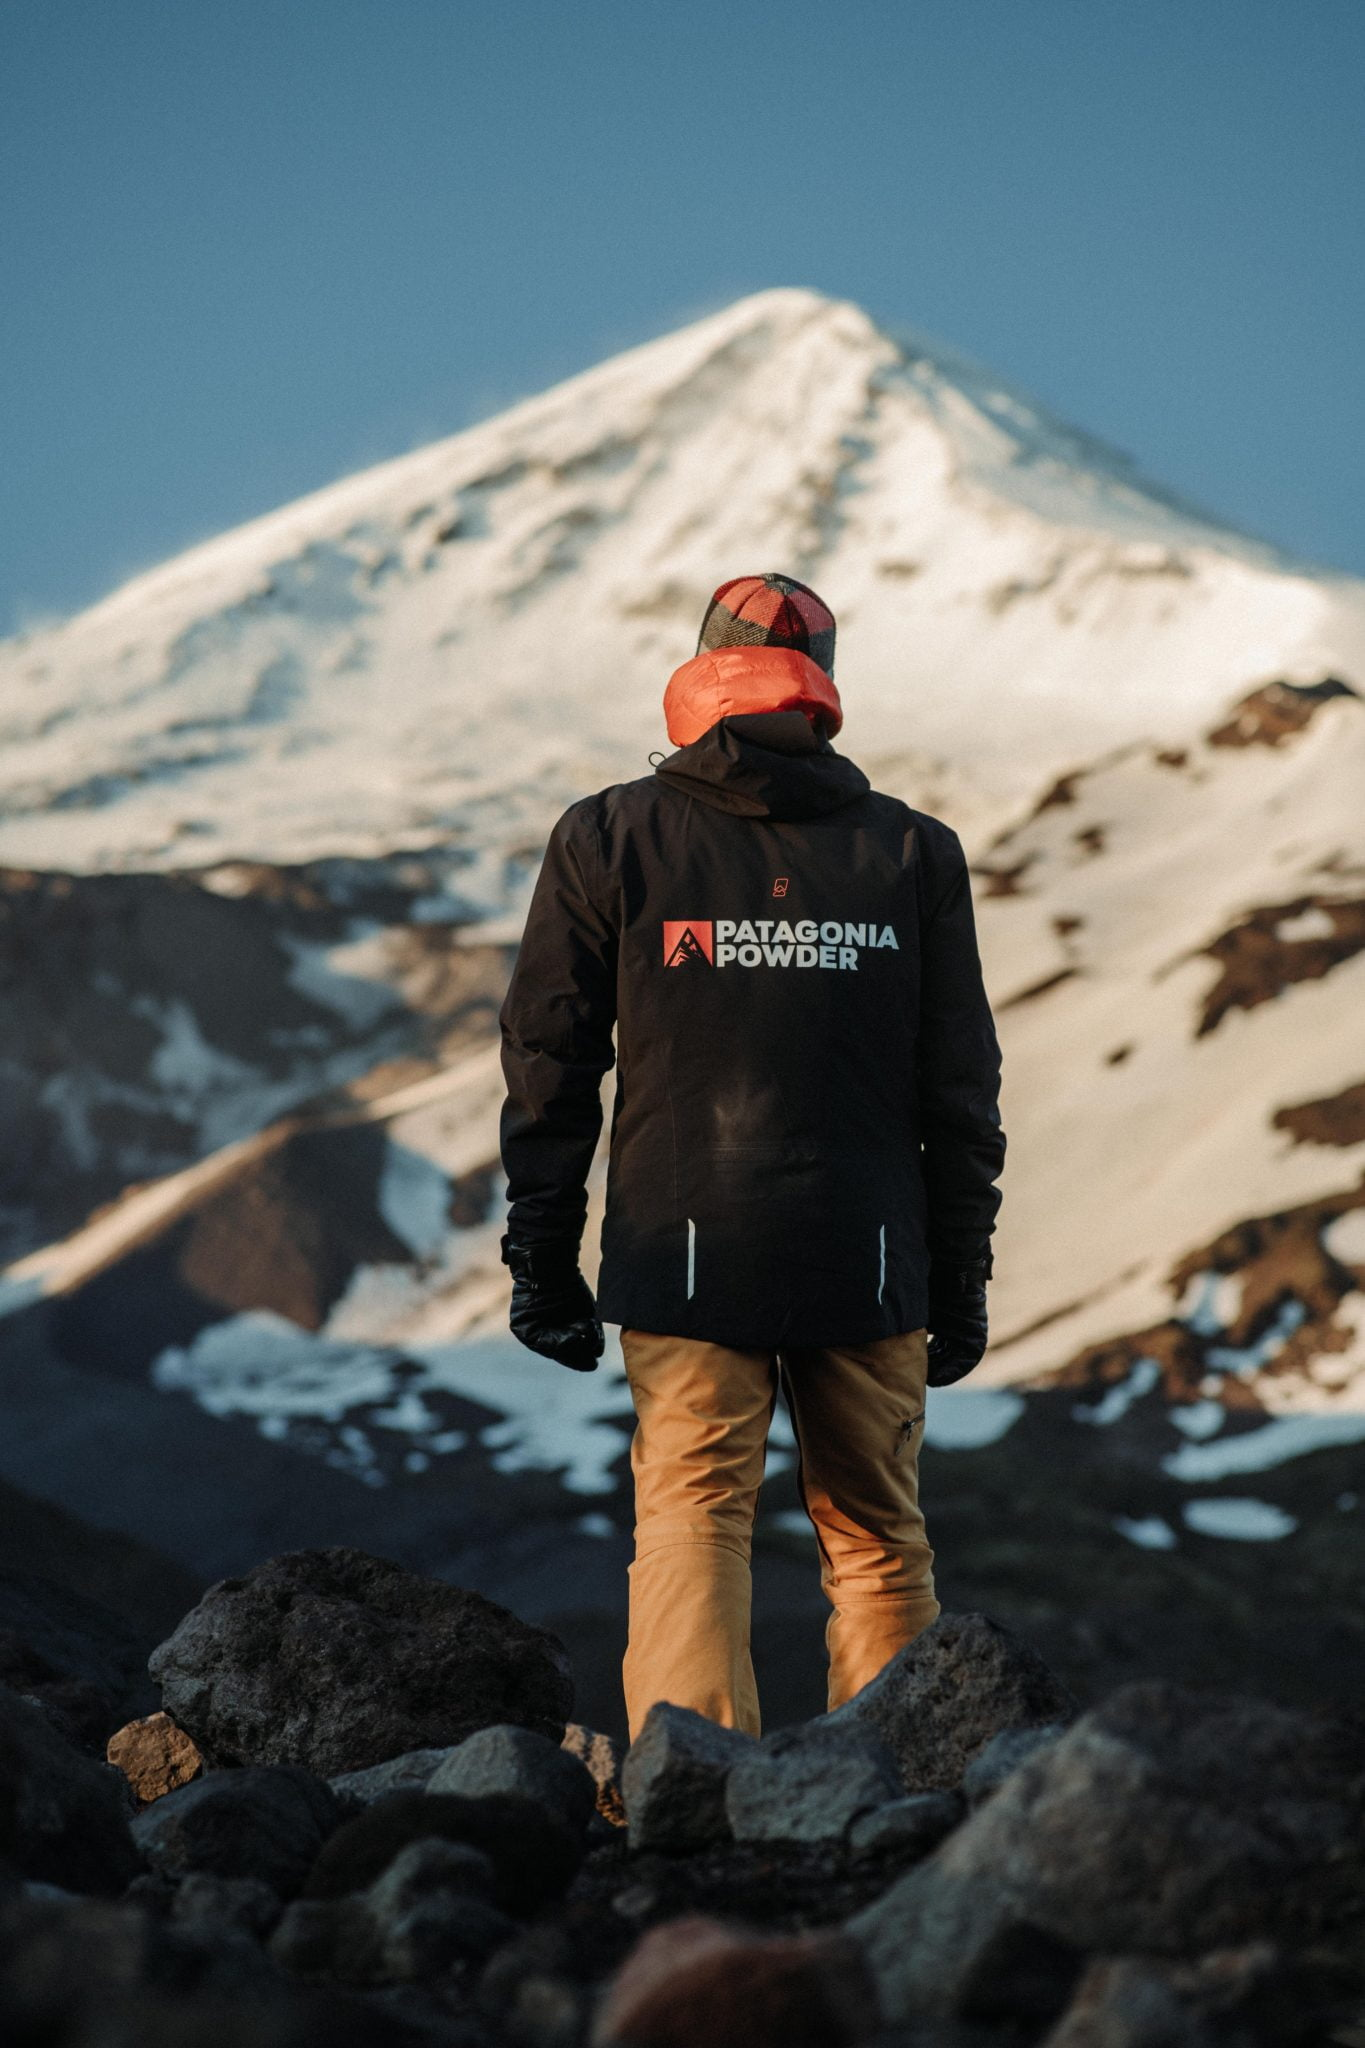 patagonia powder cerro chapelco